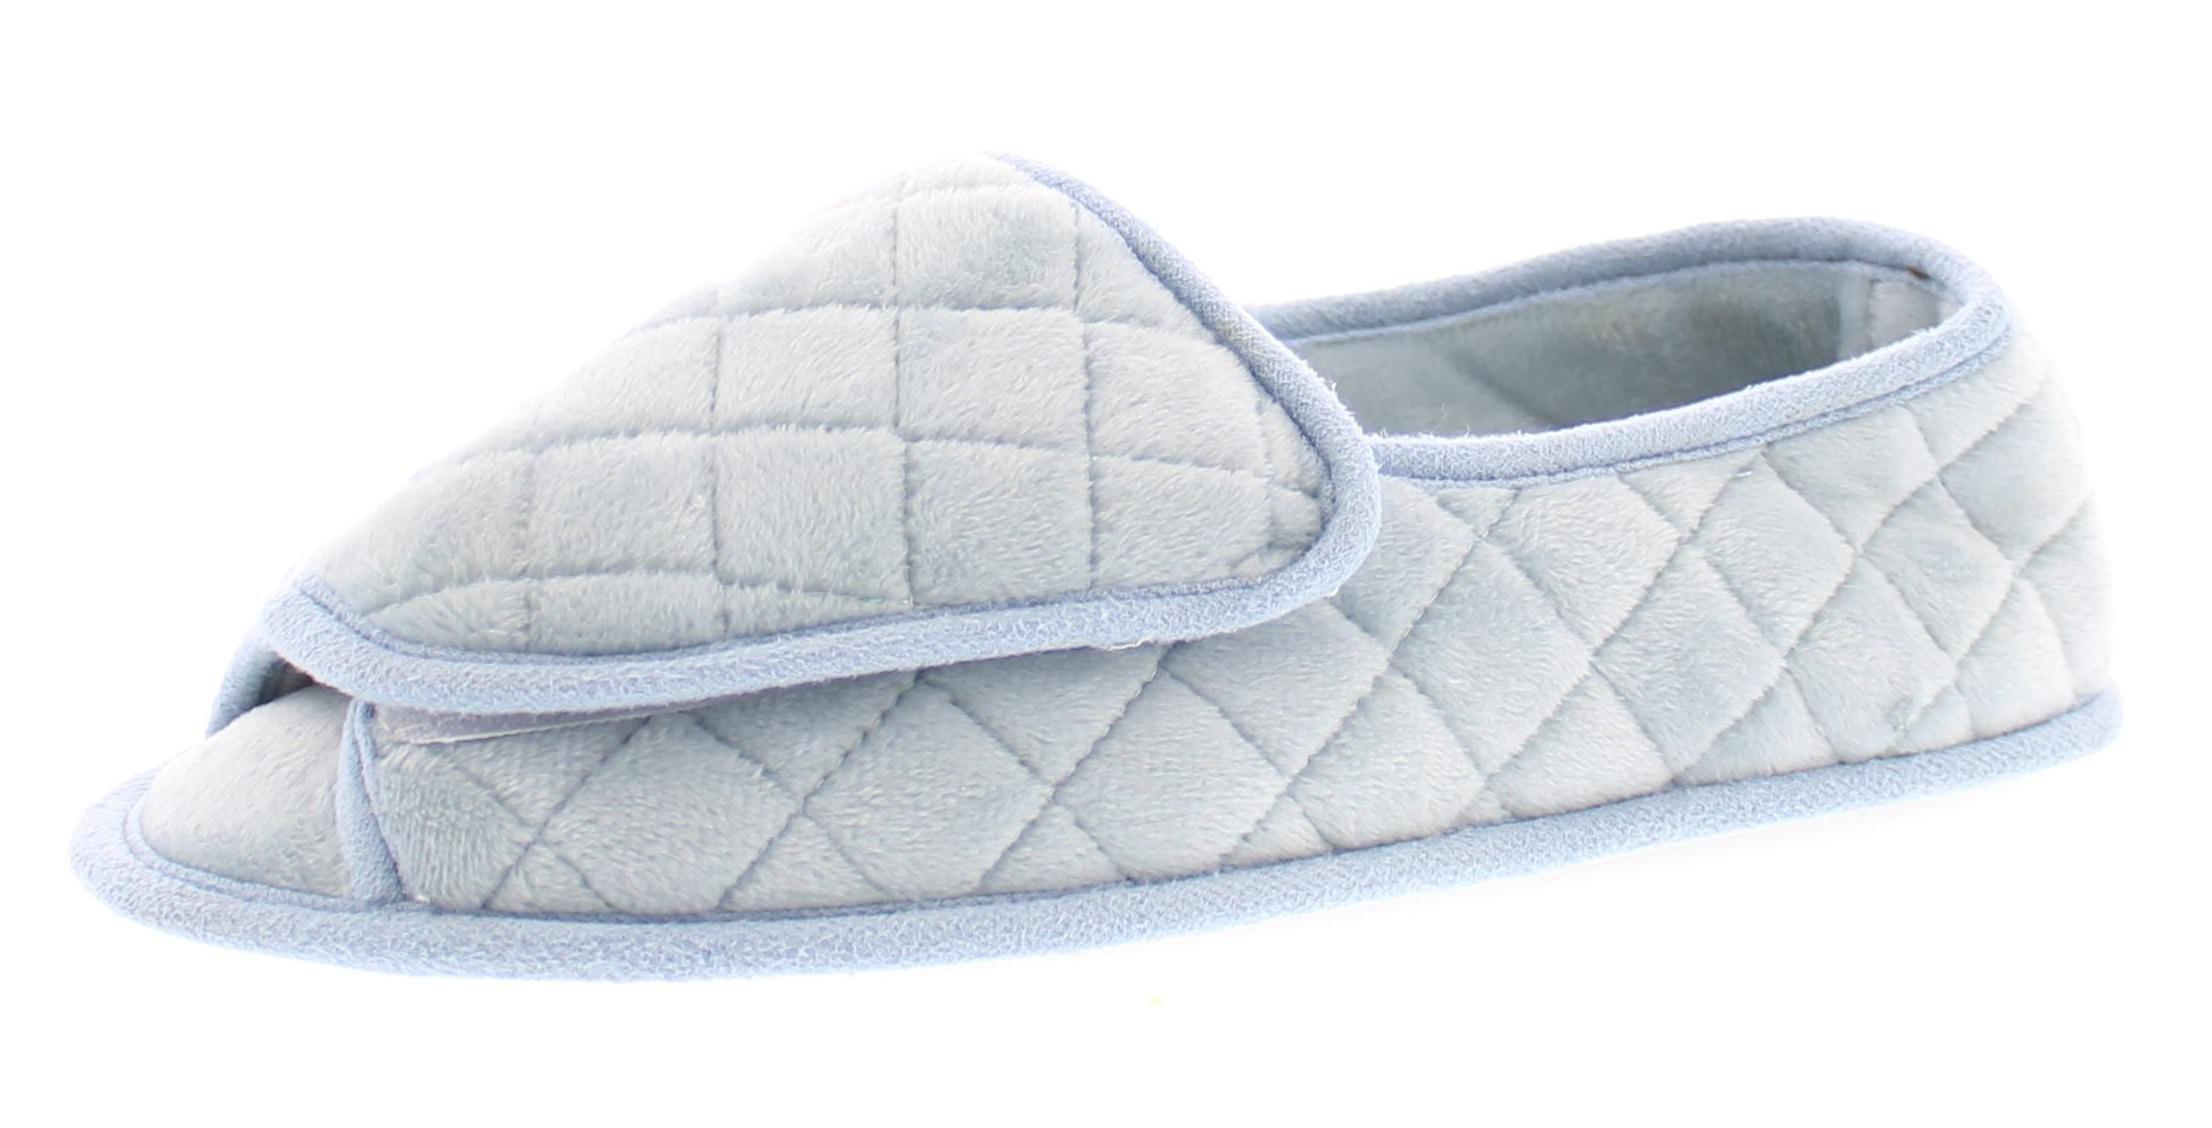 Coralee Womens Adjustable Slipper Edema,Memory Foam Orthopedic Slippers Women,Open Toe House Shoes Light Blue M 8 US